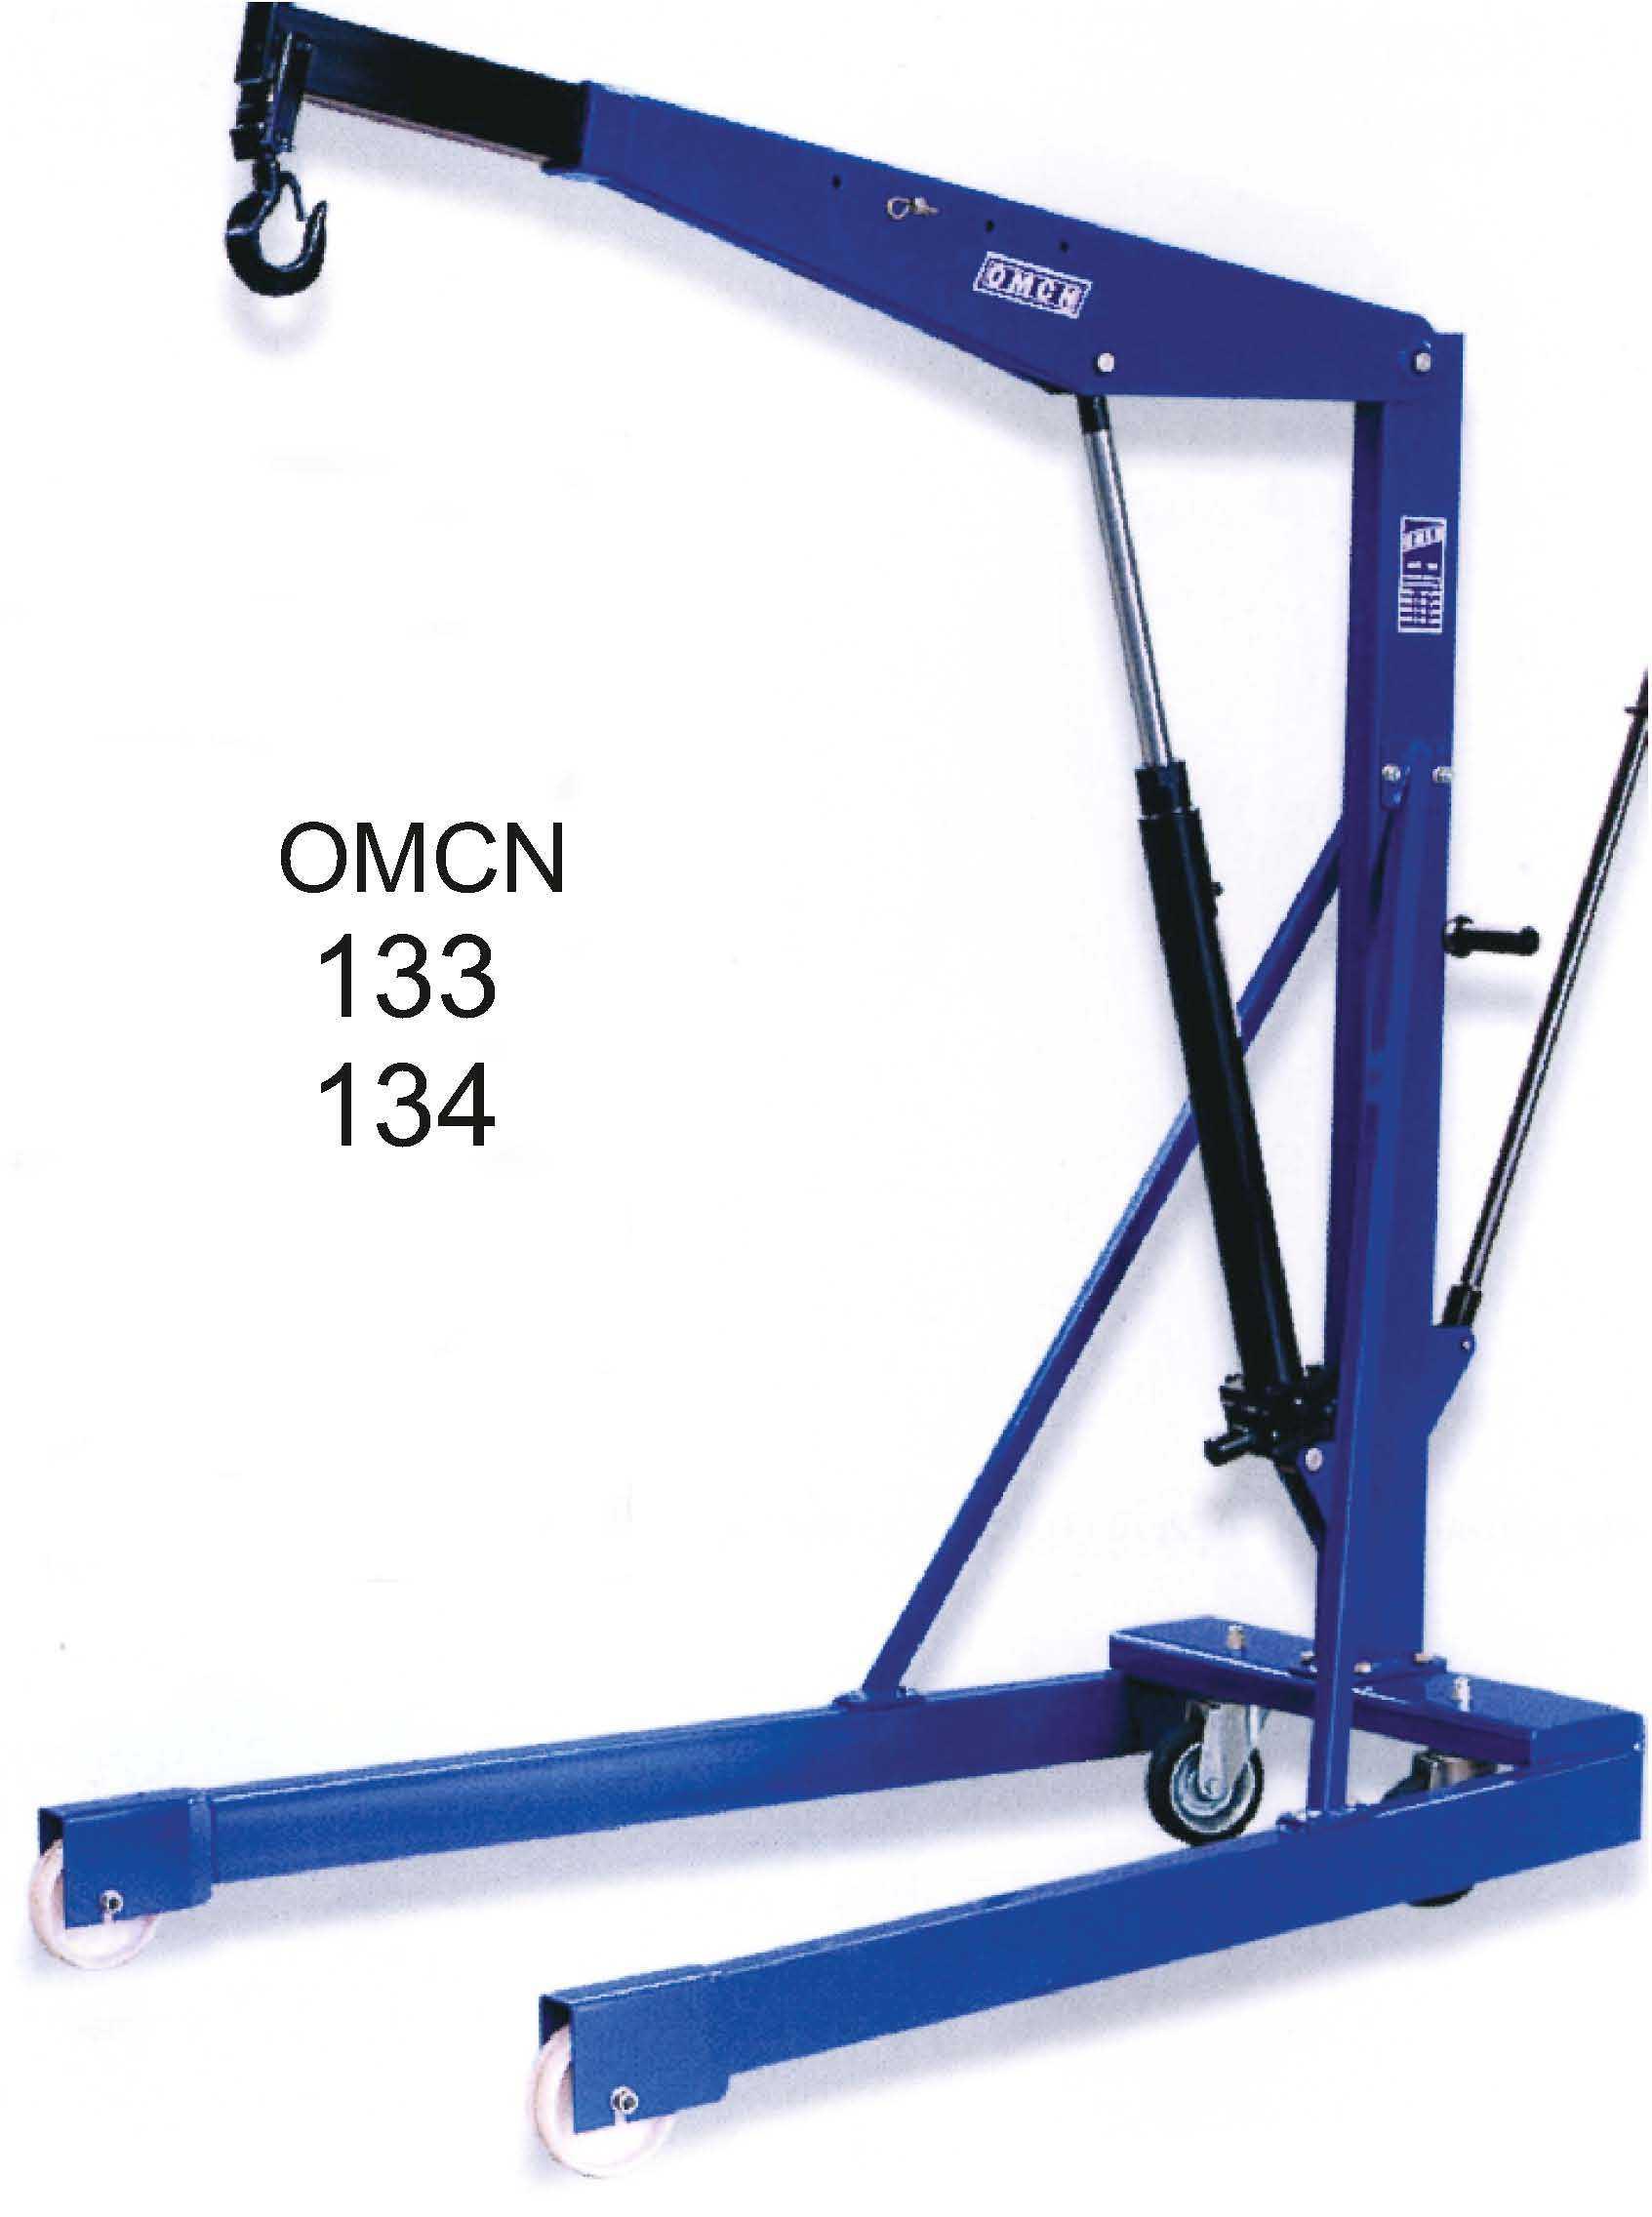 OMCN 134